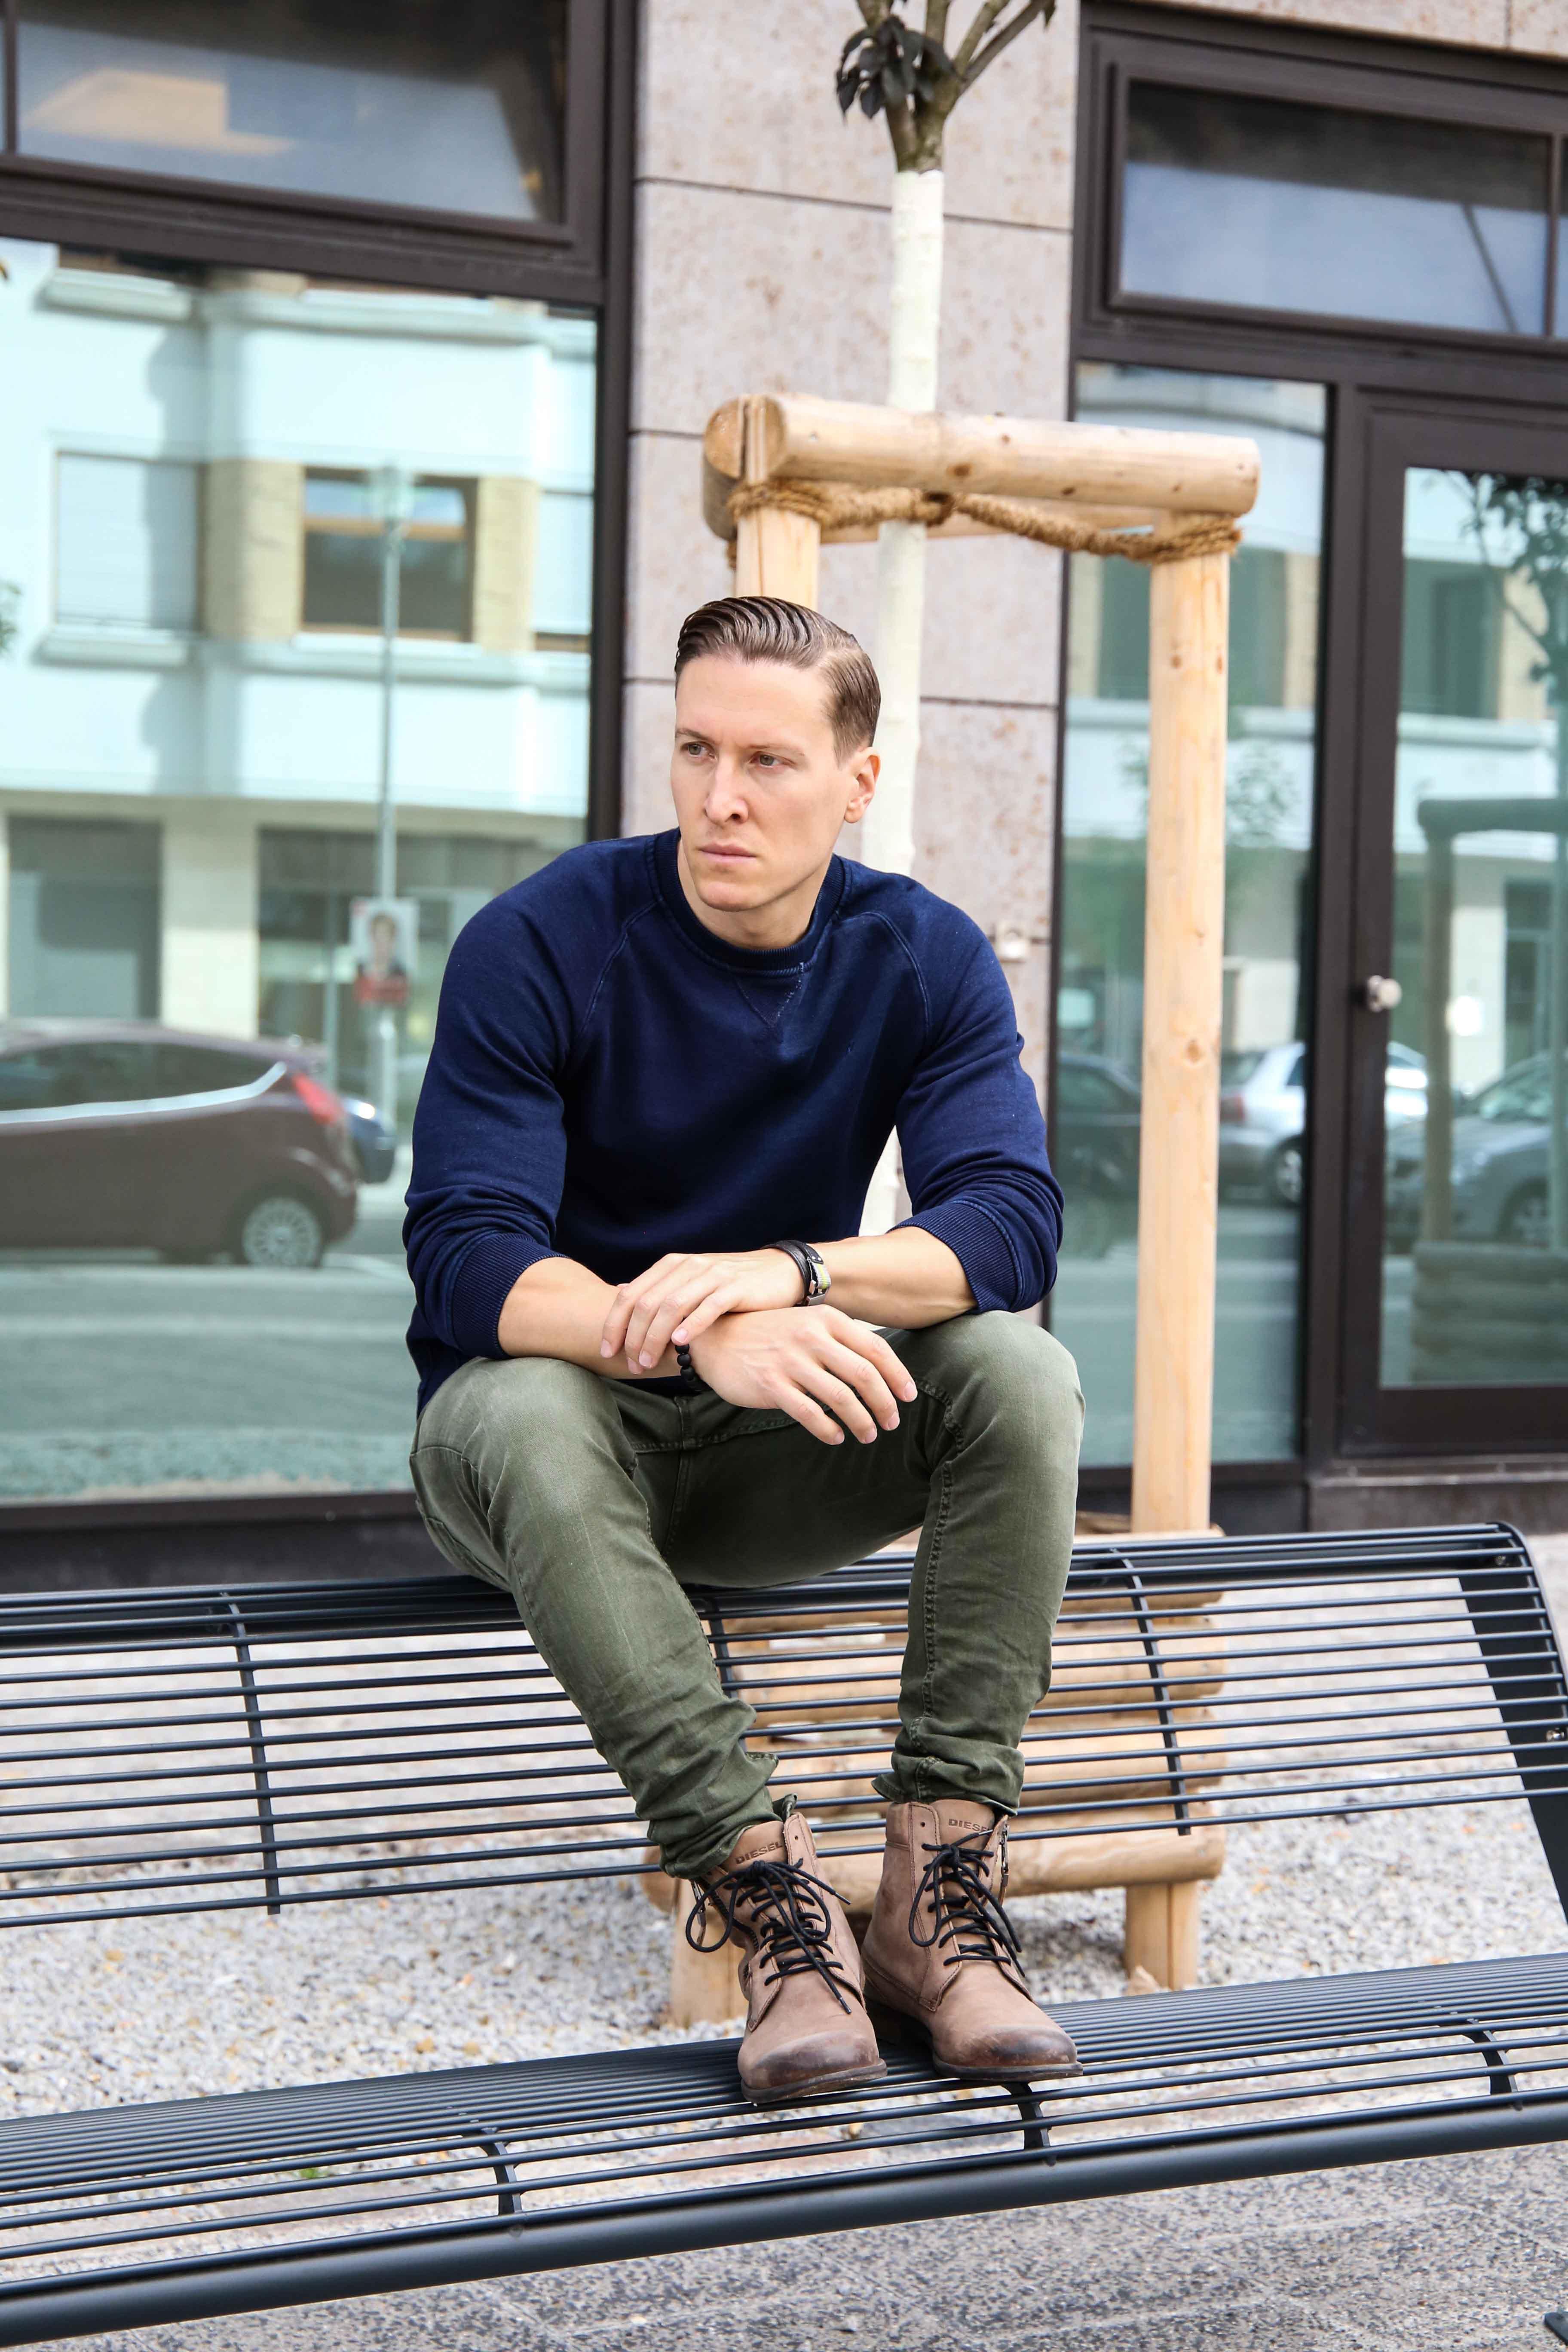 herbst-look-sweatshirt-indigo-blau-washed-skinny-jeans-grün-modeblog-männerblog-berlin_0151